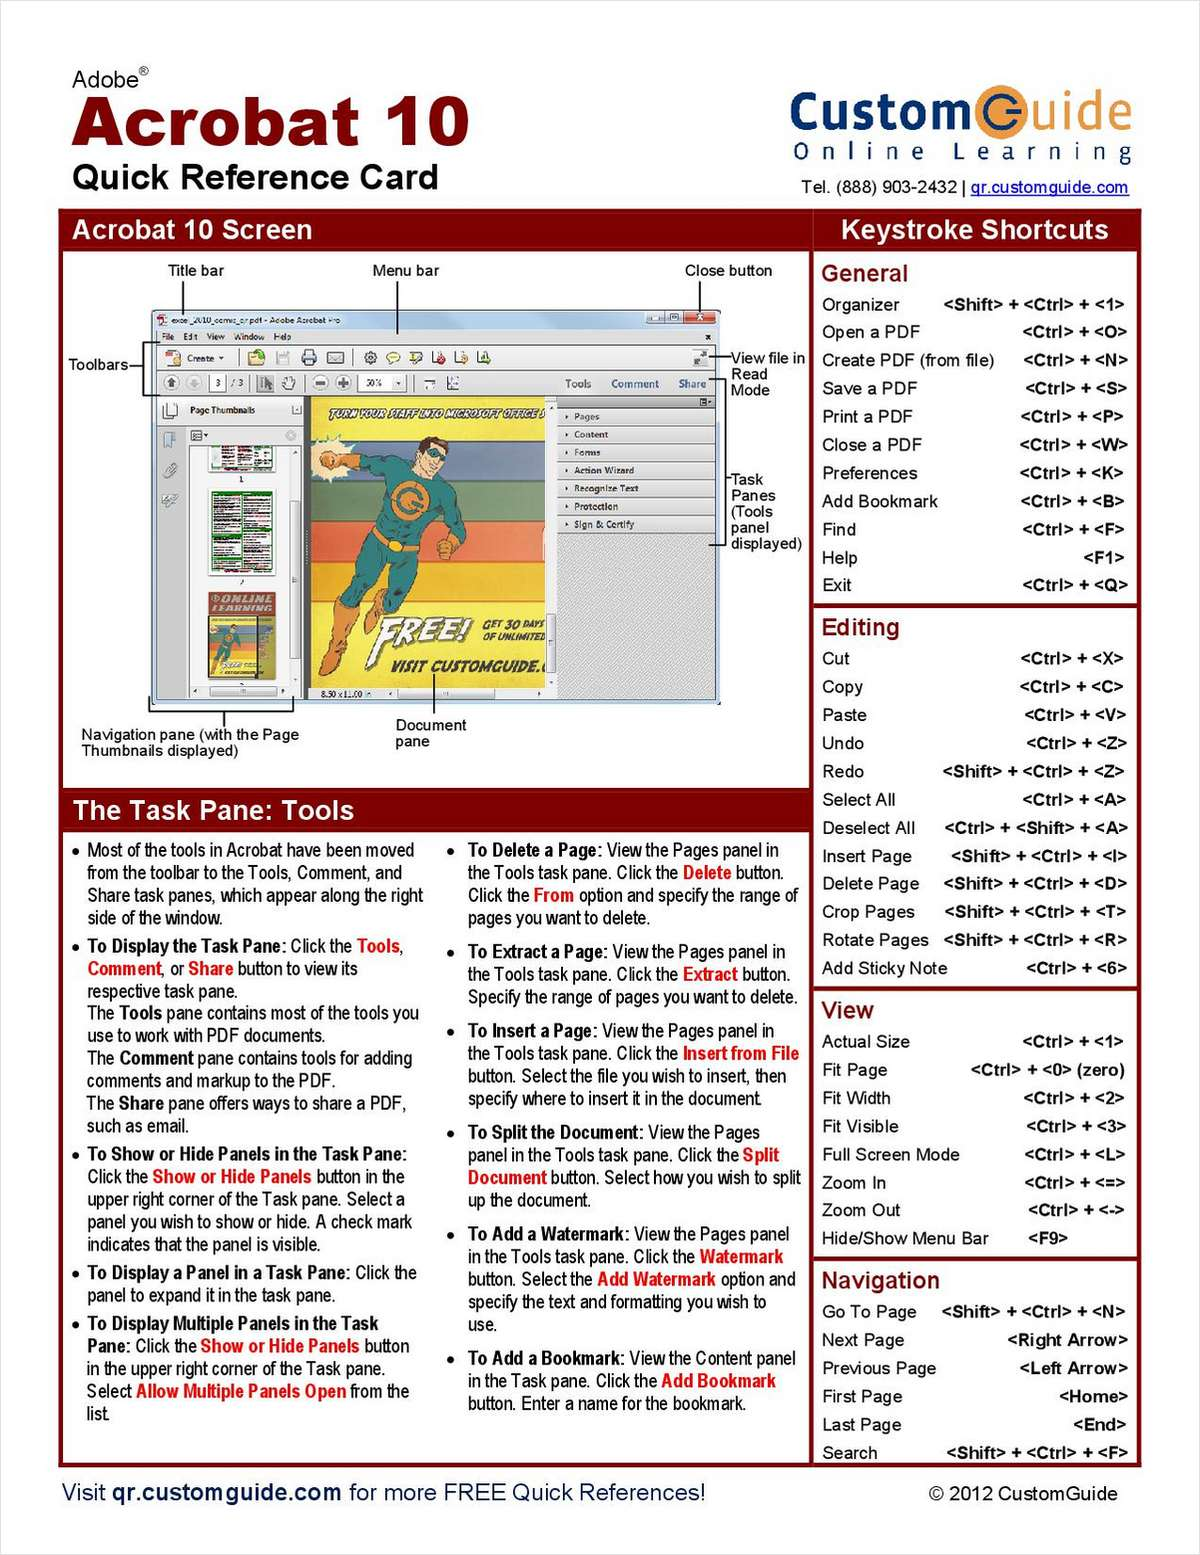 Adobe Acrobat 10 - Free Quick Reference Card